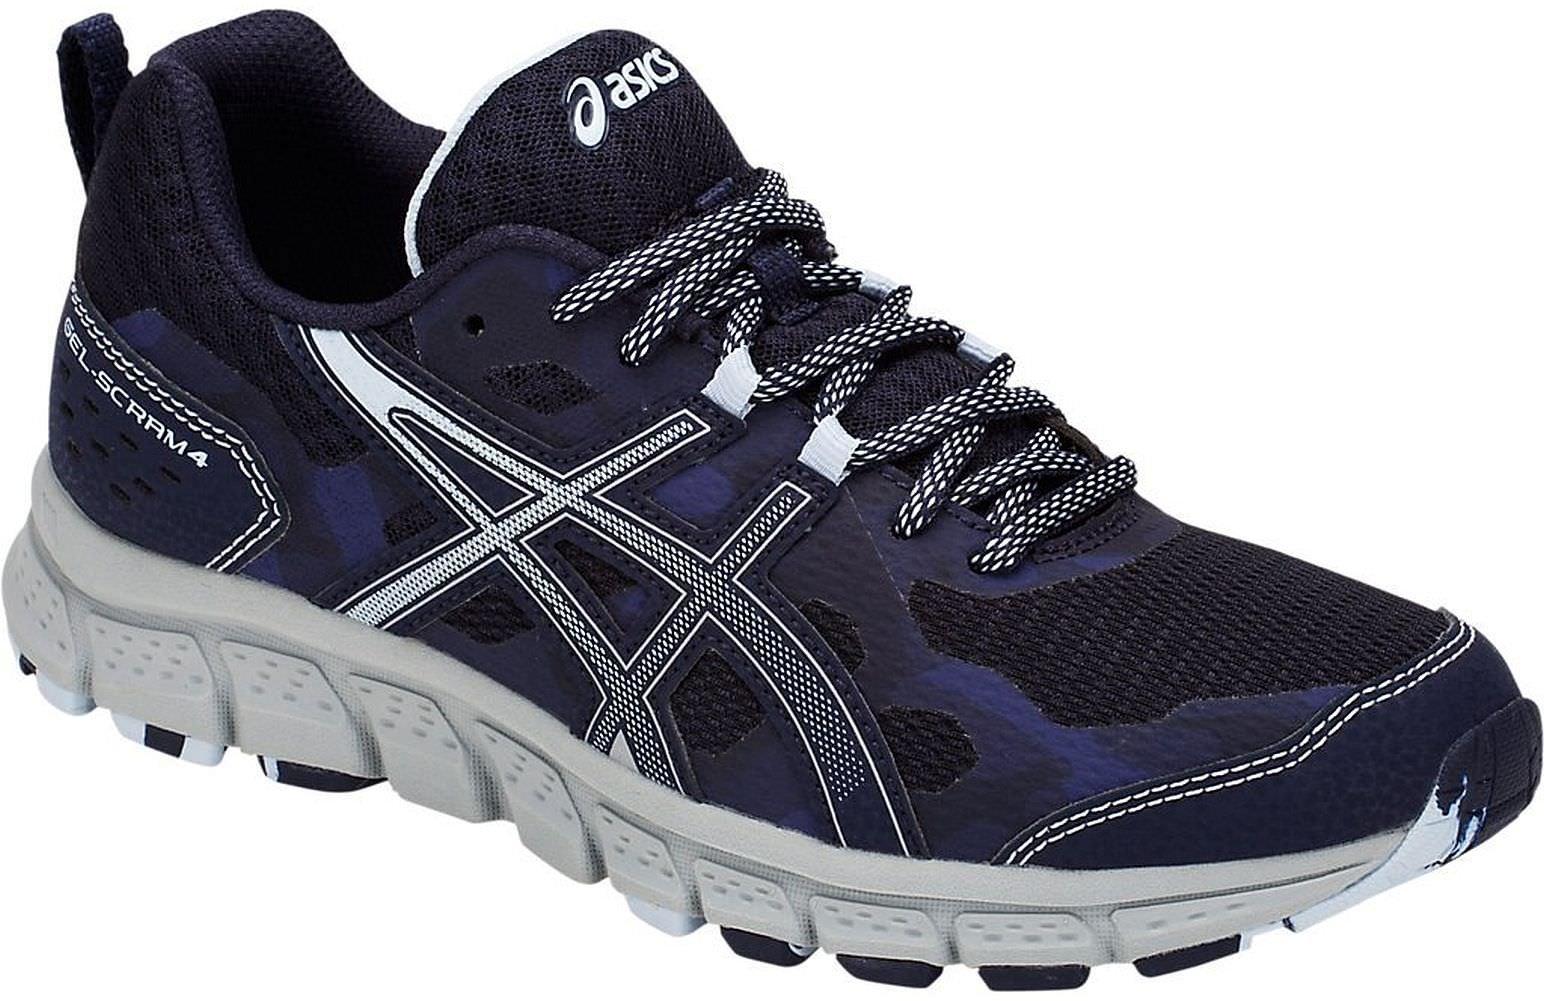 ASICS 1012A039 Women's Gel-Scram 4 Running Shoe, Peacoat/Soft Sky - 5 B(M) US by ASICS (Image #1)